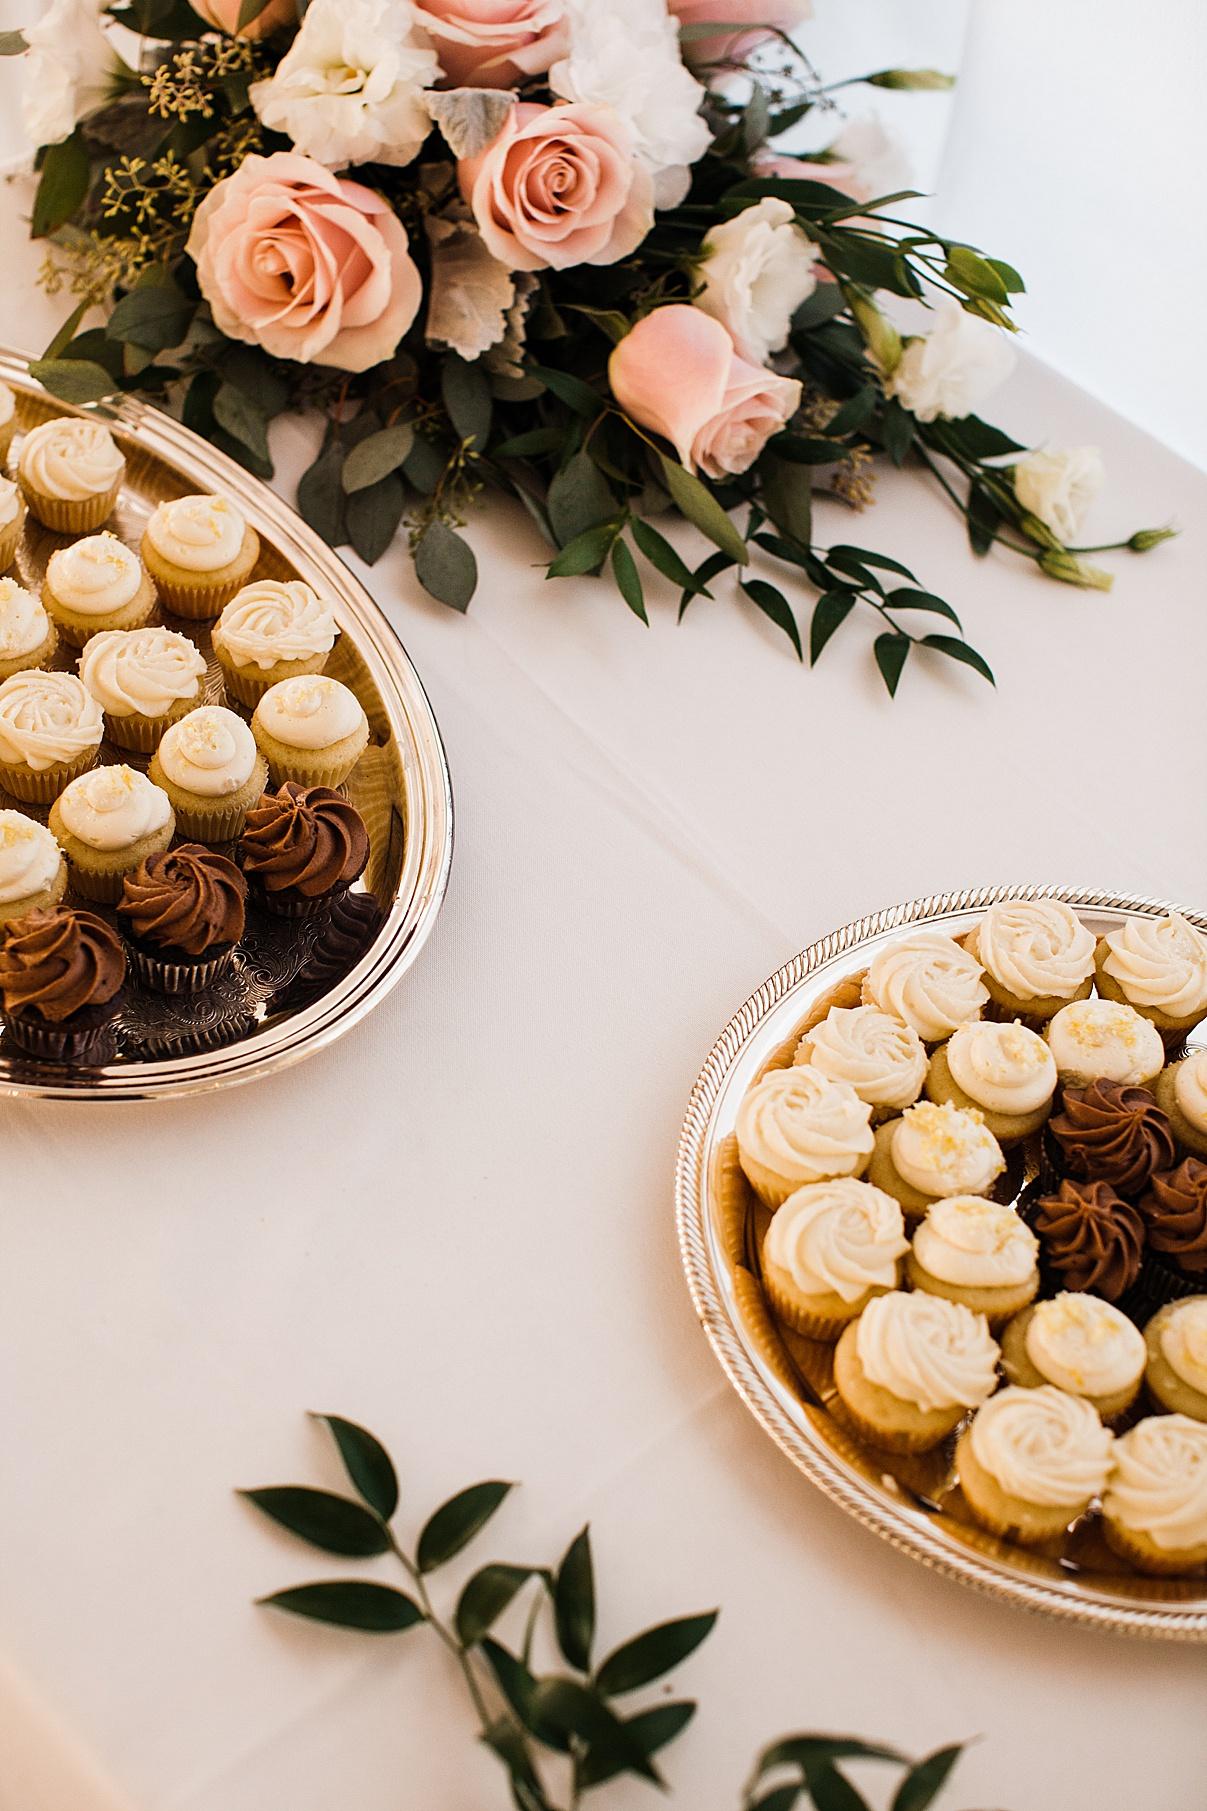 Cupcakes at wedding reception| Harding Waterfront Estate Wedding| Ontario wedding photographer| Toronto wedding photographer| 3 Photography | 3photography.ca